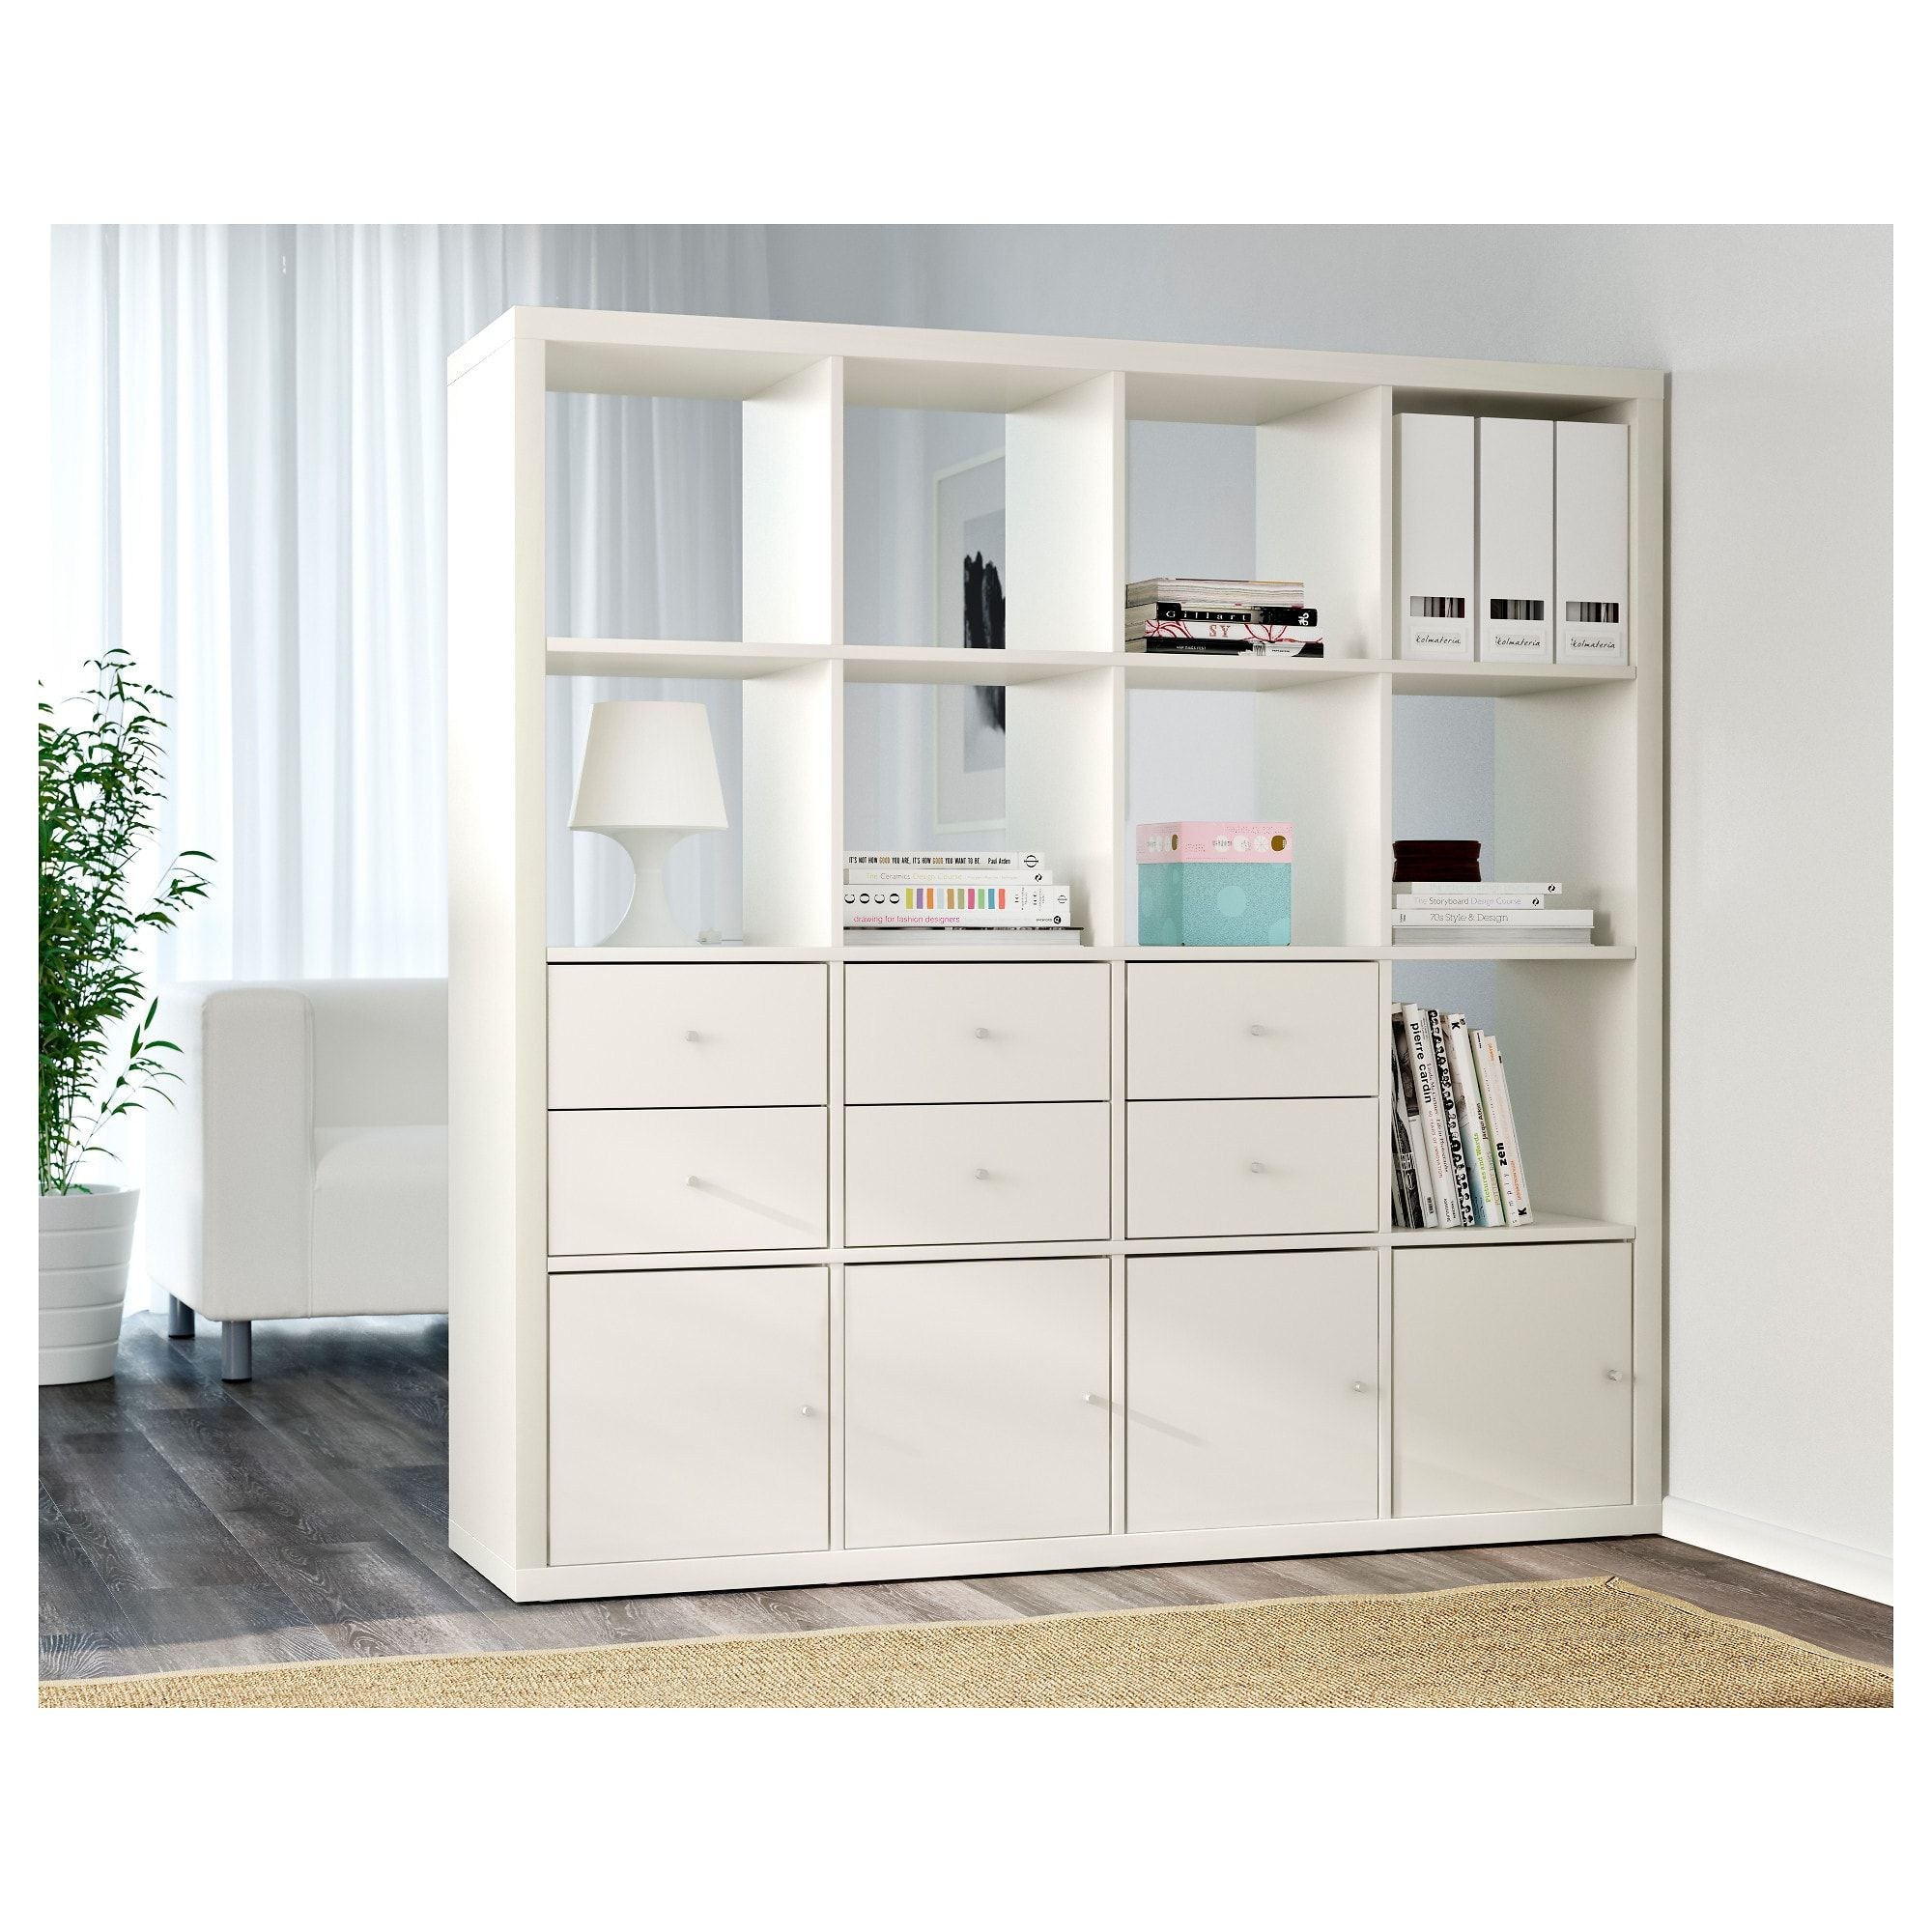 kallax shelf unit white in 2019 mobile home ideas. Black Bedroom Furniture Sets. Home Design Ideas